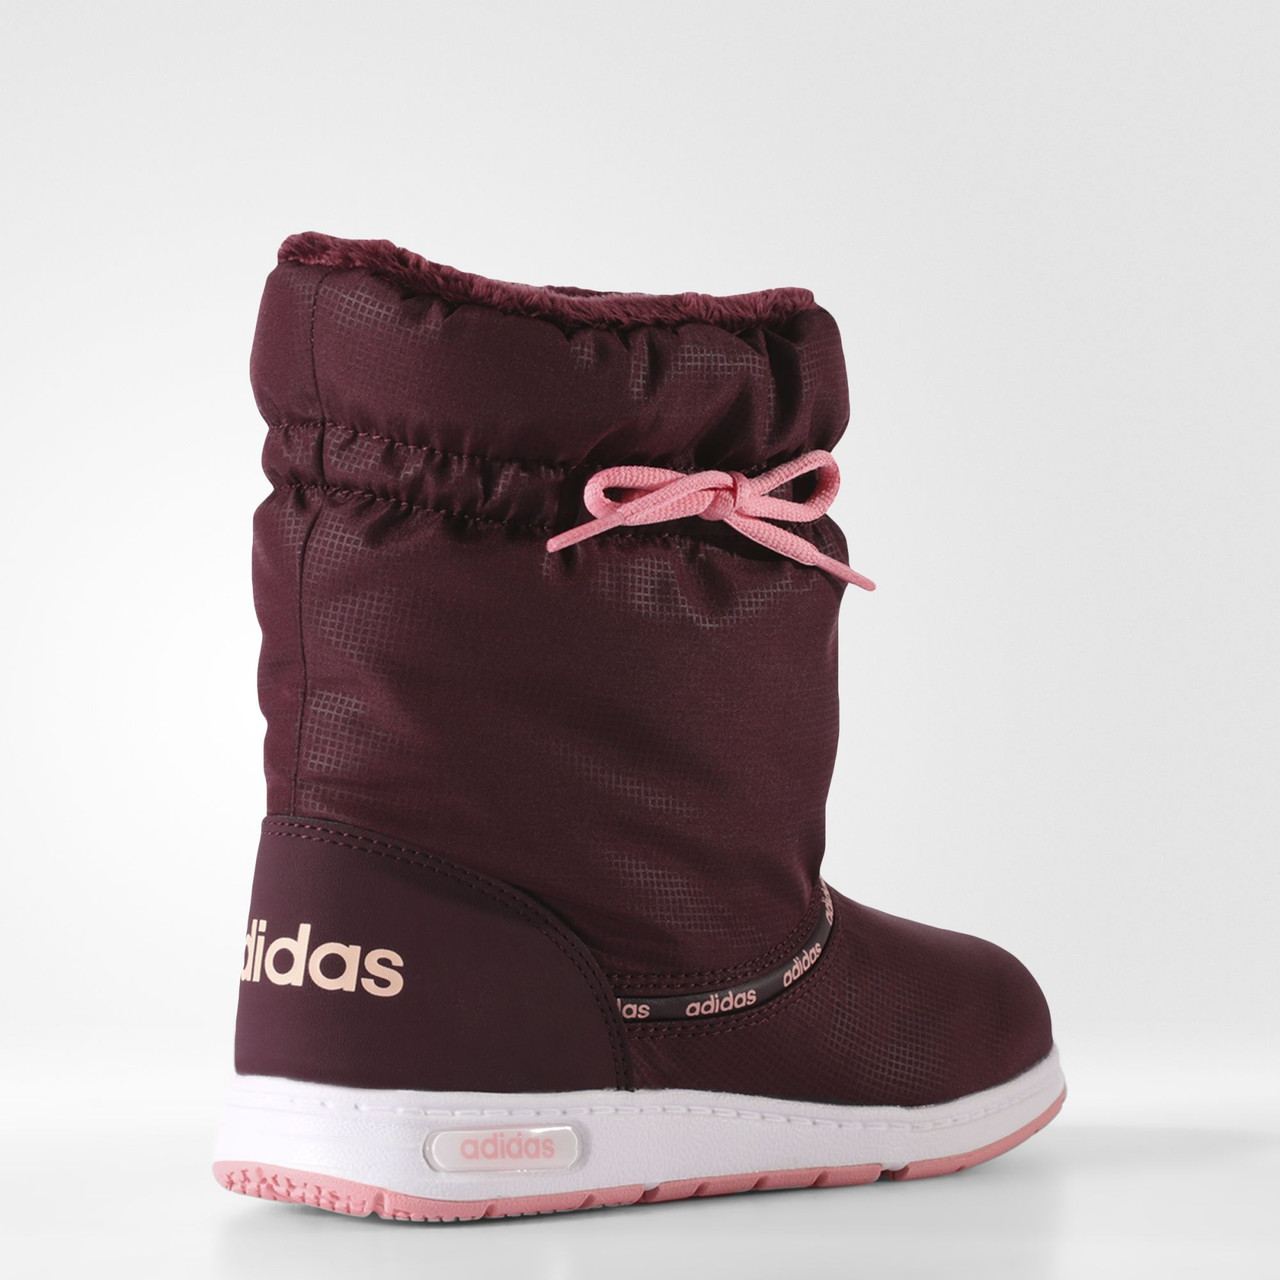 ??????? ?????? Adidas Neo Warm Comfort (???????: AW4289)